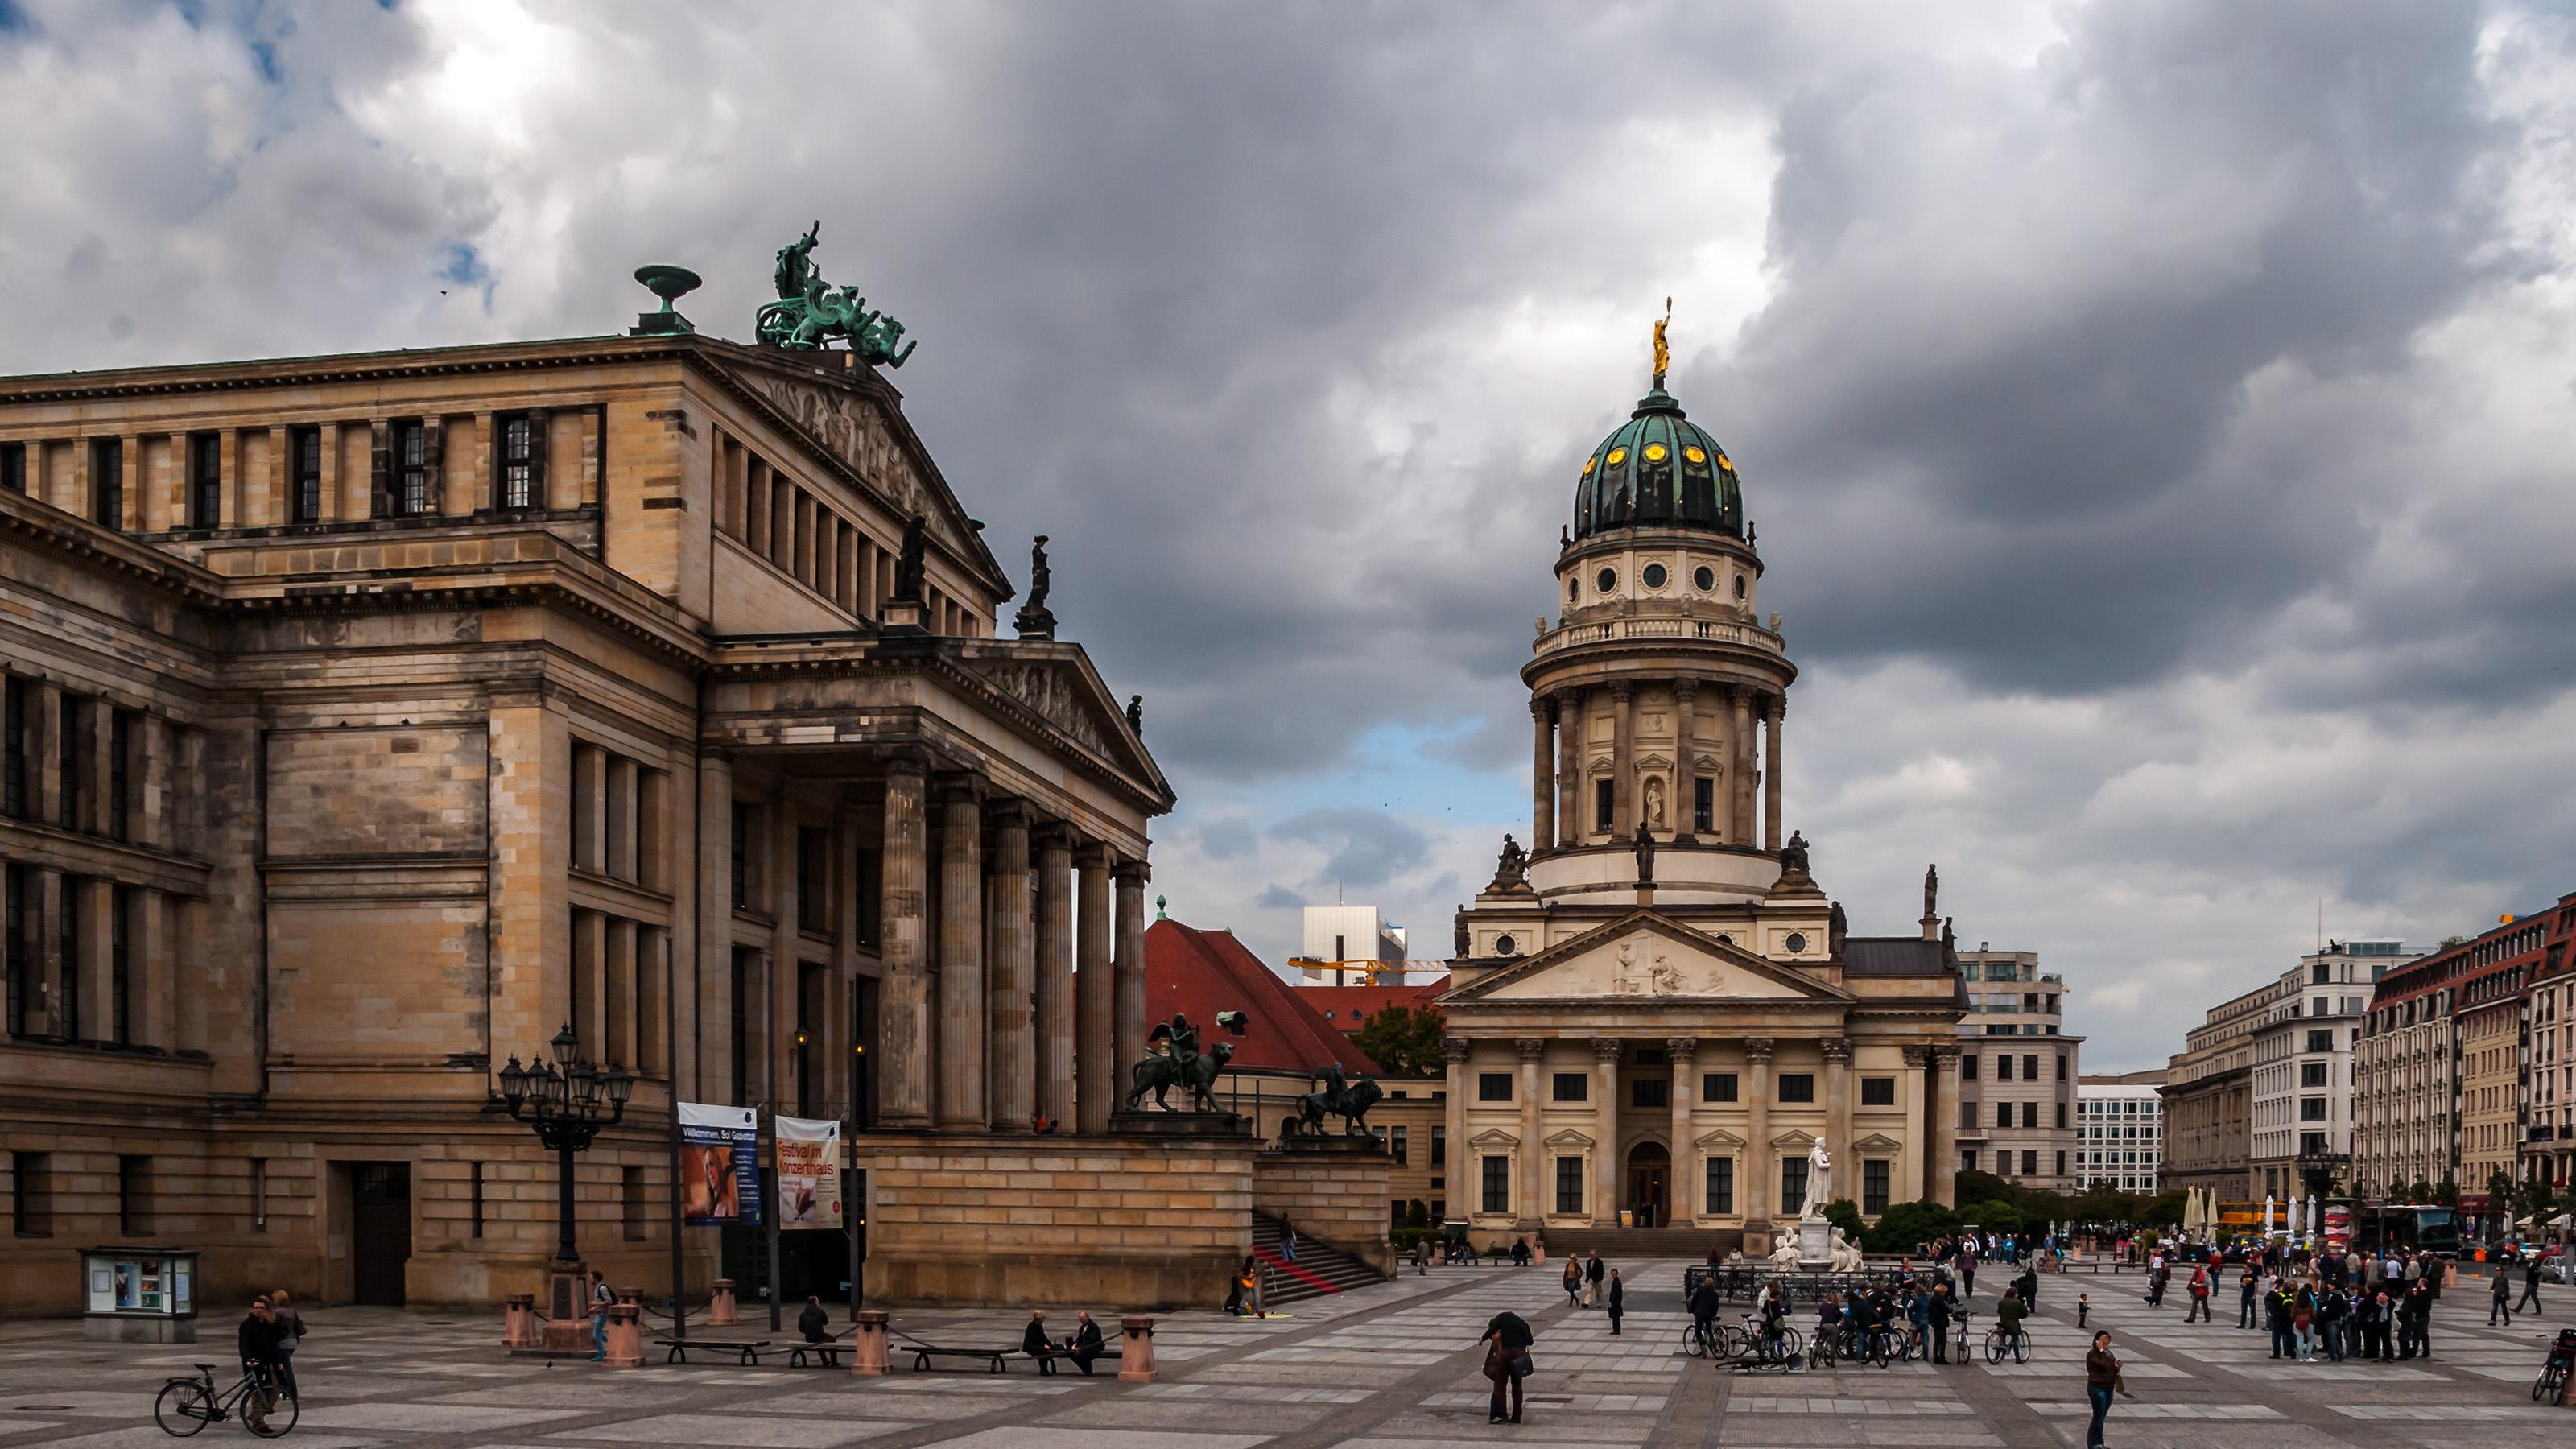 franz sische friedrichstadtkirche in berlin wgm picture. Black Bedroom Furniture Sets. Home Design Ideas